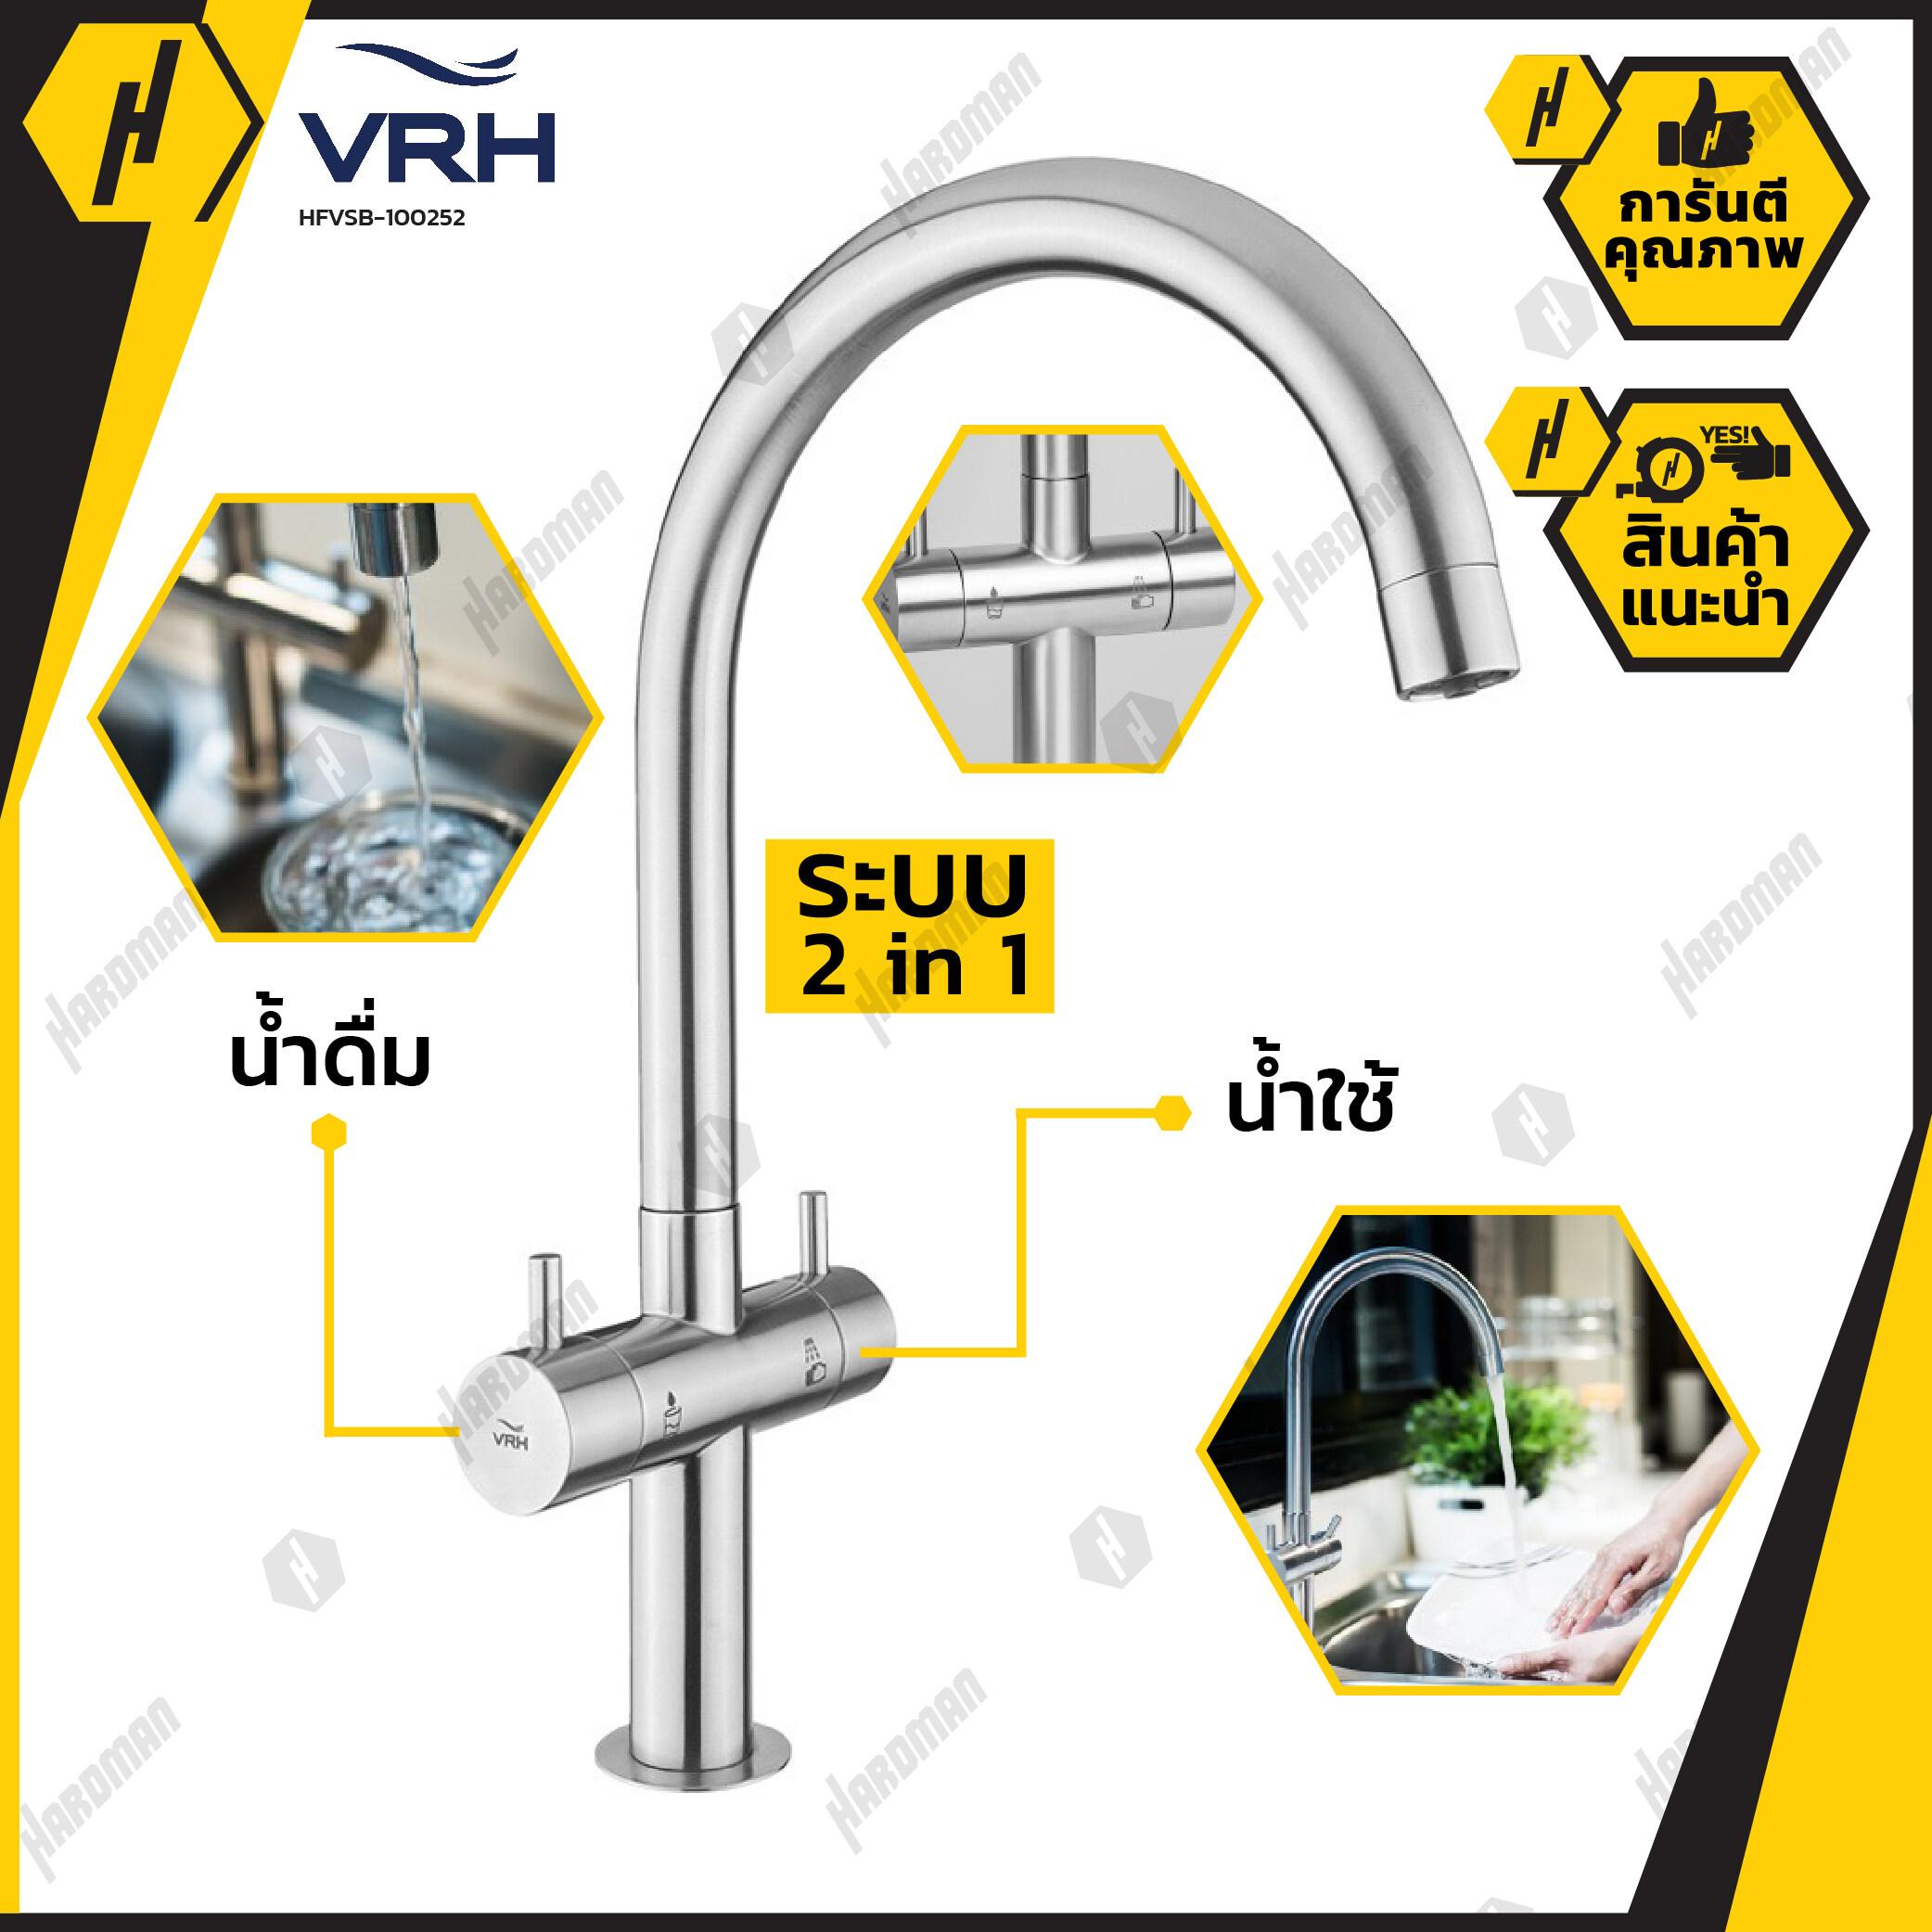 VRH ก๊อกน้ำดื่ม-น้ำใช้ คอสวิง แบบตั้งพื้น พร้อมสต็อปวาล์ว 3 ทาง HFVSB-100252 รุ่น DUO+